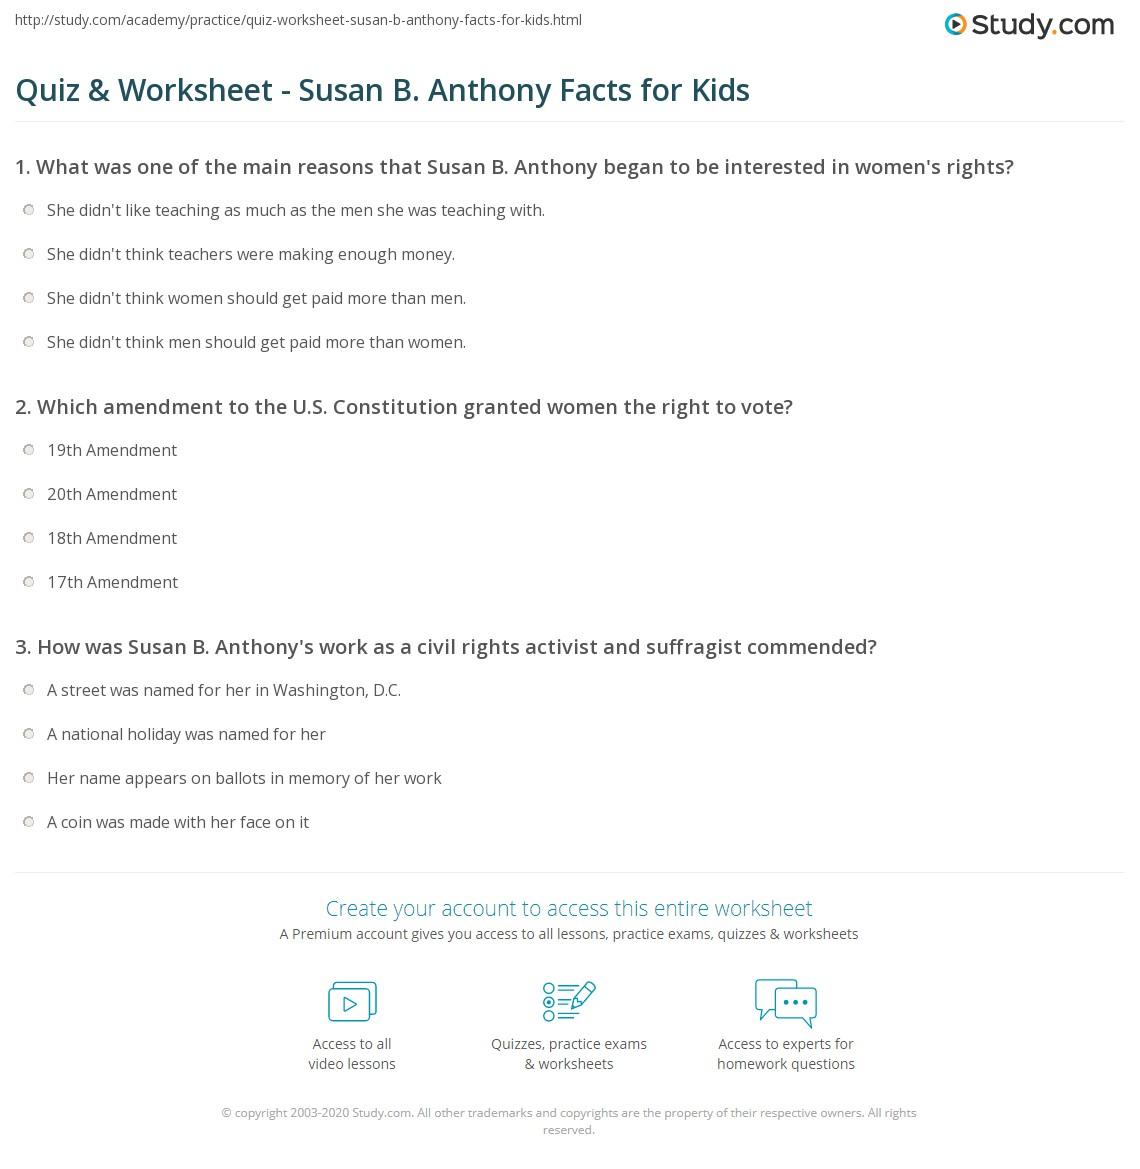 Quiz & Worksheet - Susan B. Anthony Facts for Kids | Study.com